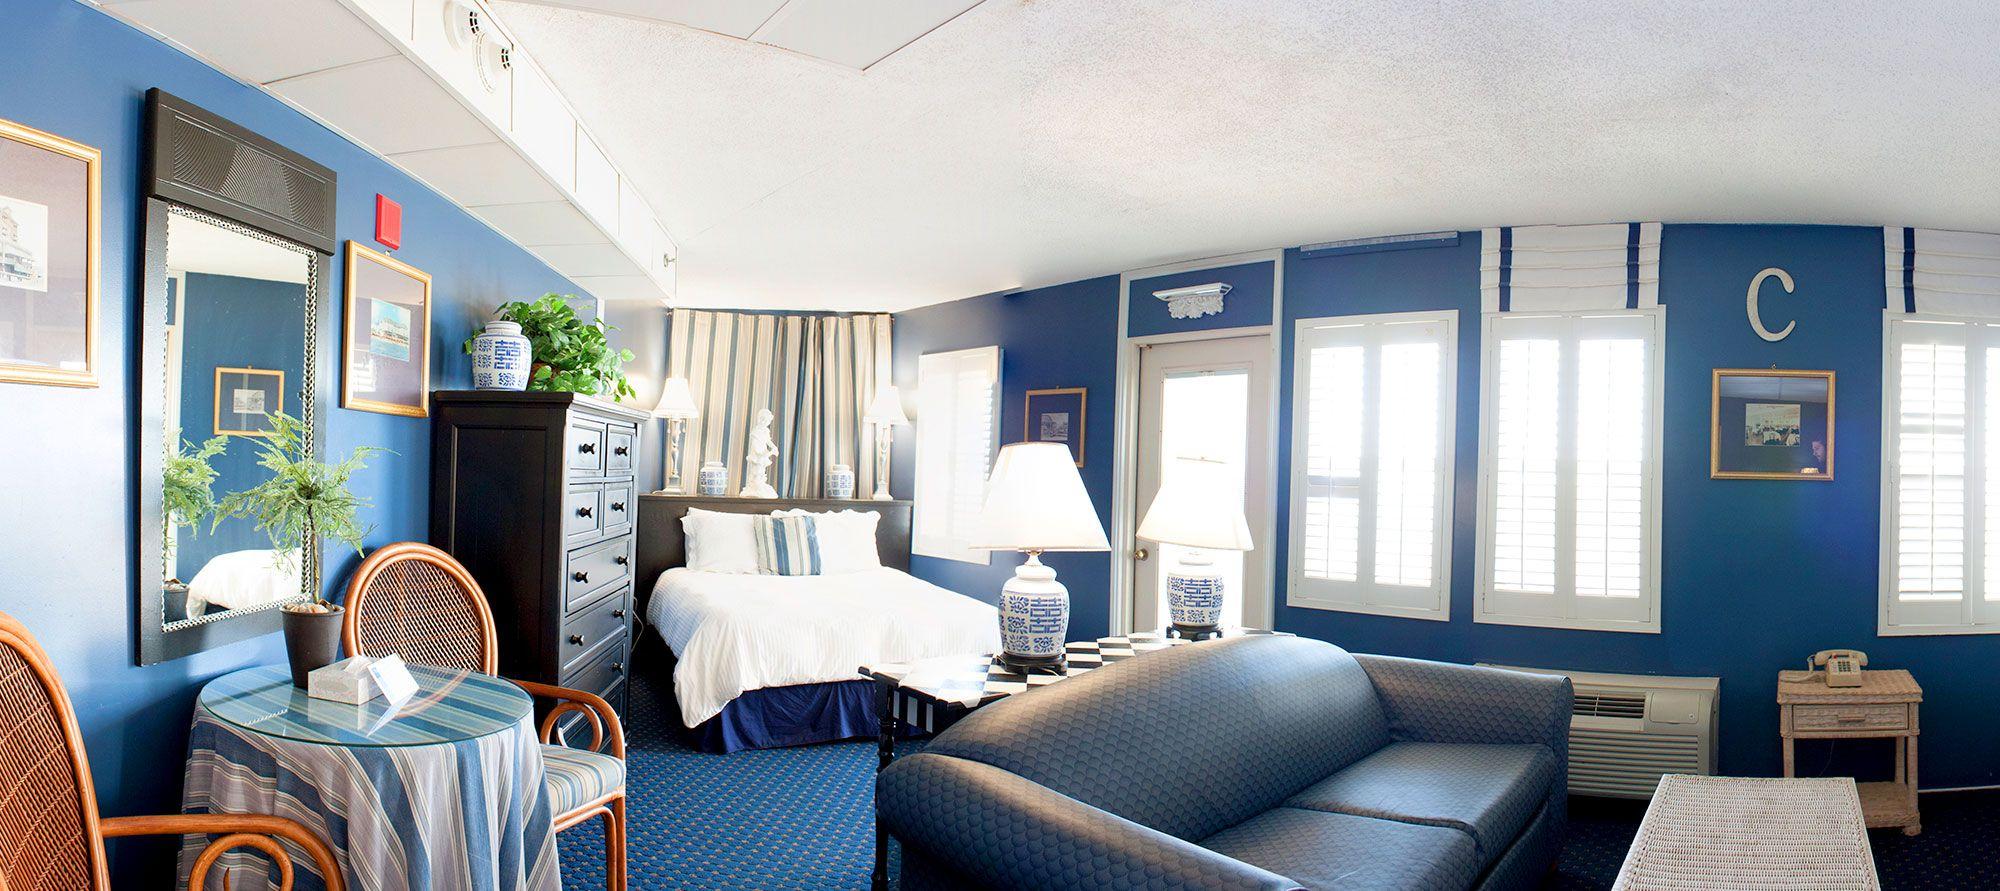 An Ocean City Md Beachfront Hotel Ocean City 2 Bedroom Suites Ocean City Md Hotels